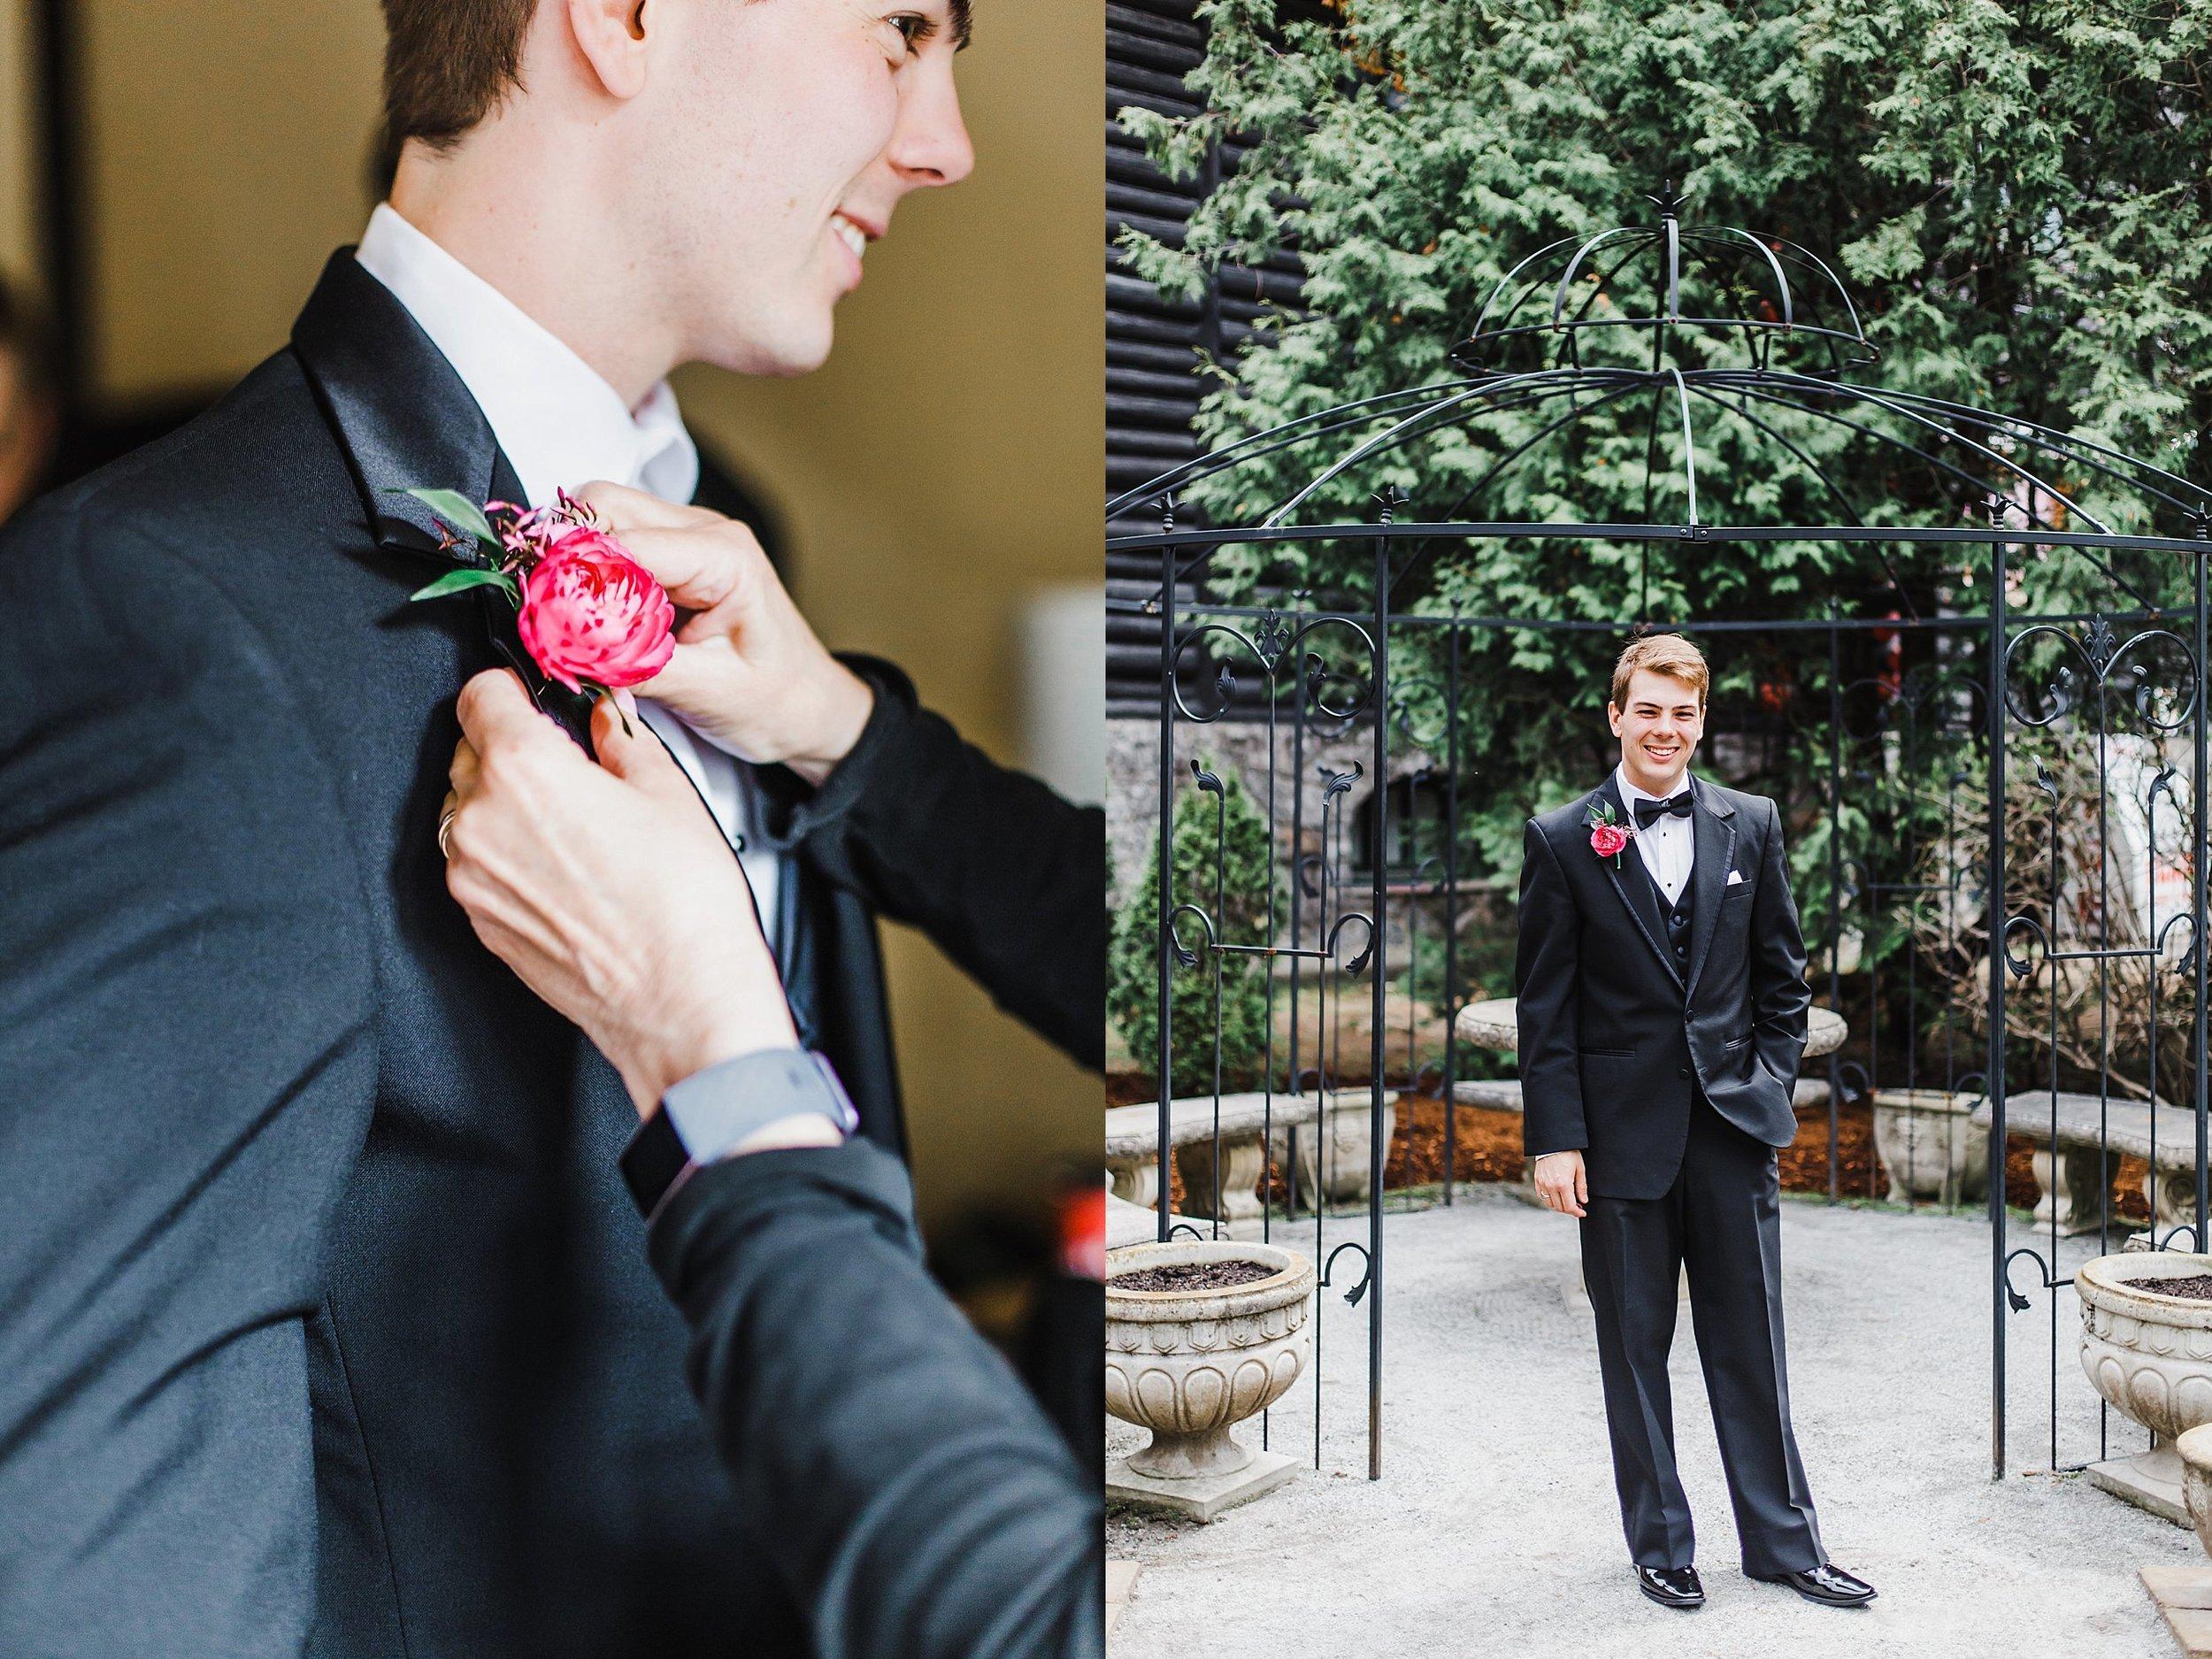 light airy indie fine art ottawa wedding photographer | Ali and Batoul Photography_0131.jpg